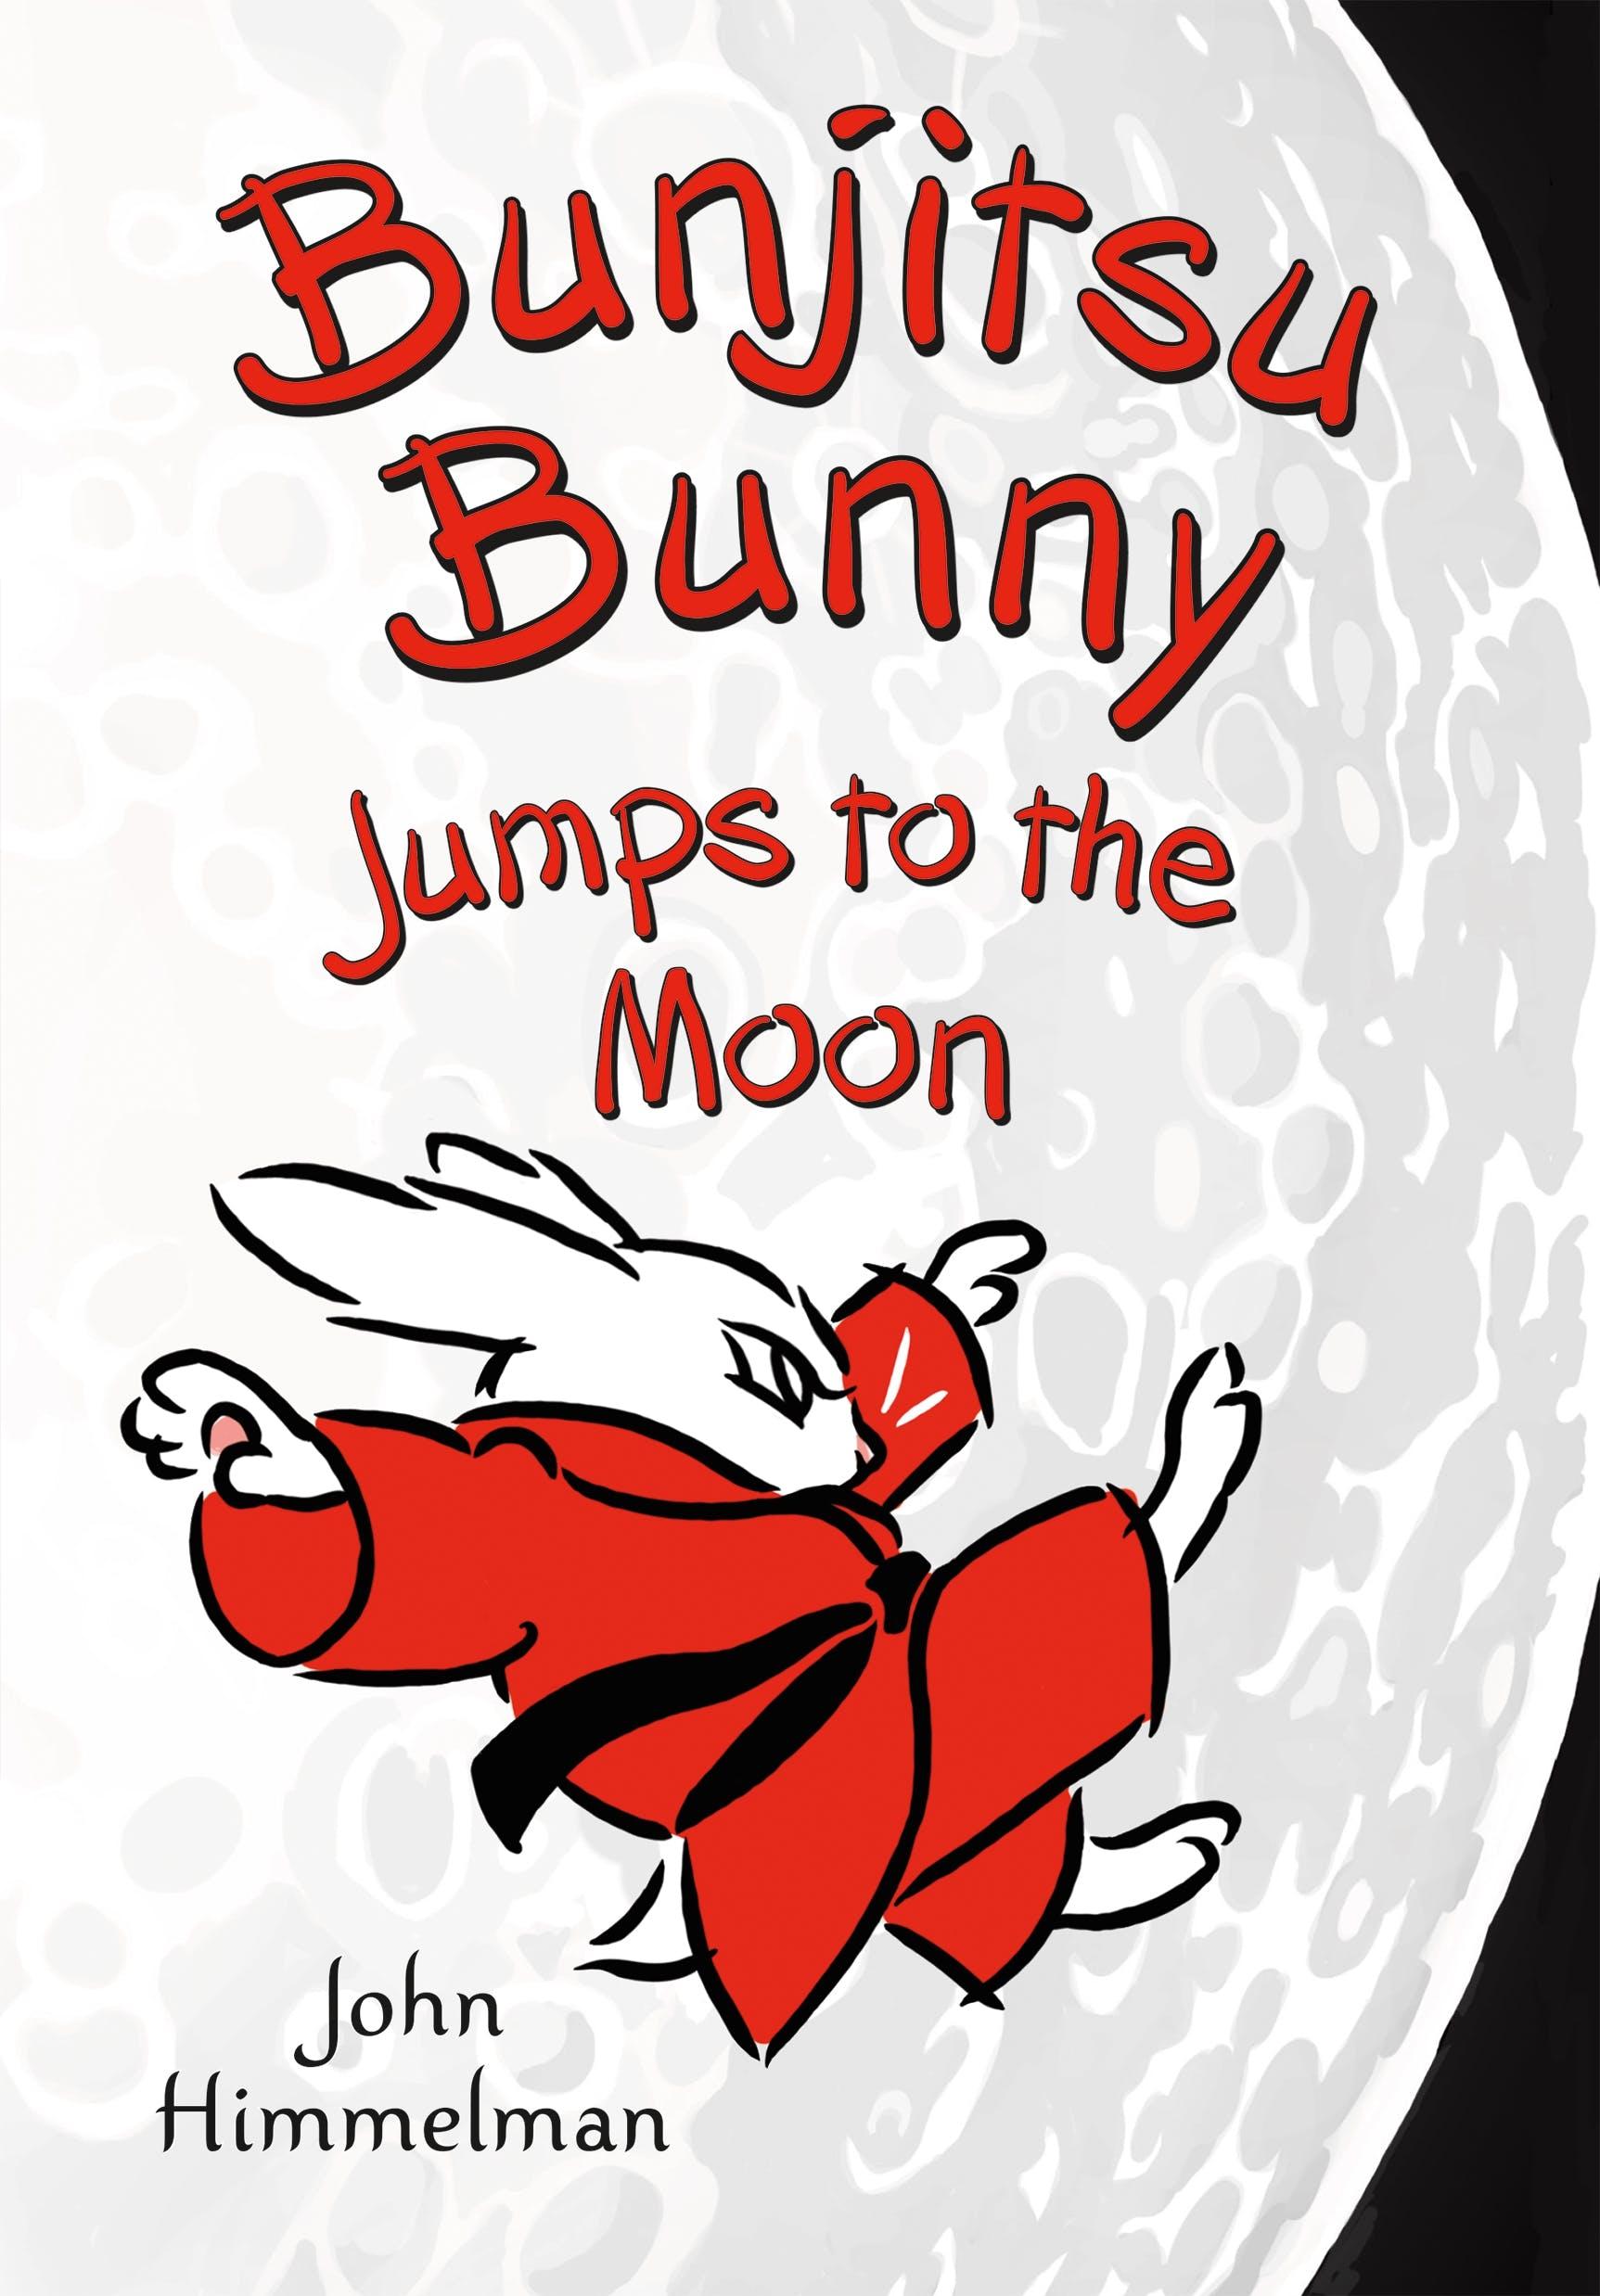 Image of Bunjitsu Bunny Jumps to the Moon